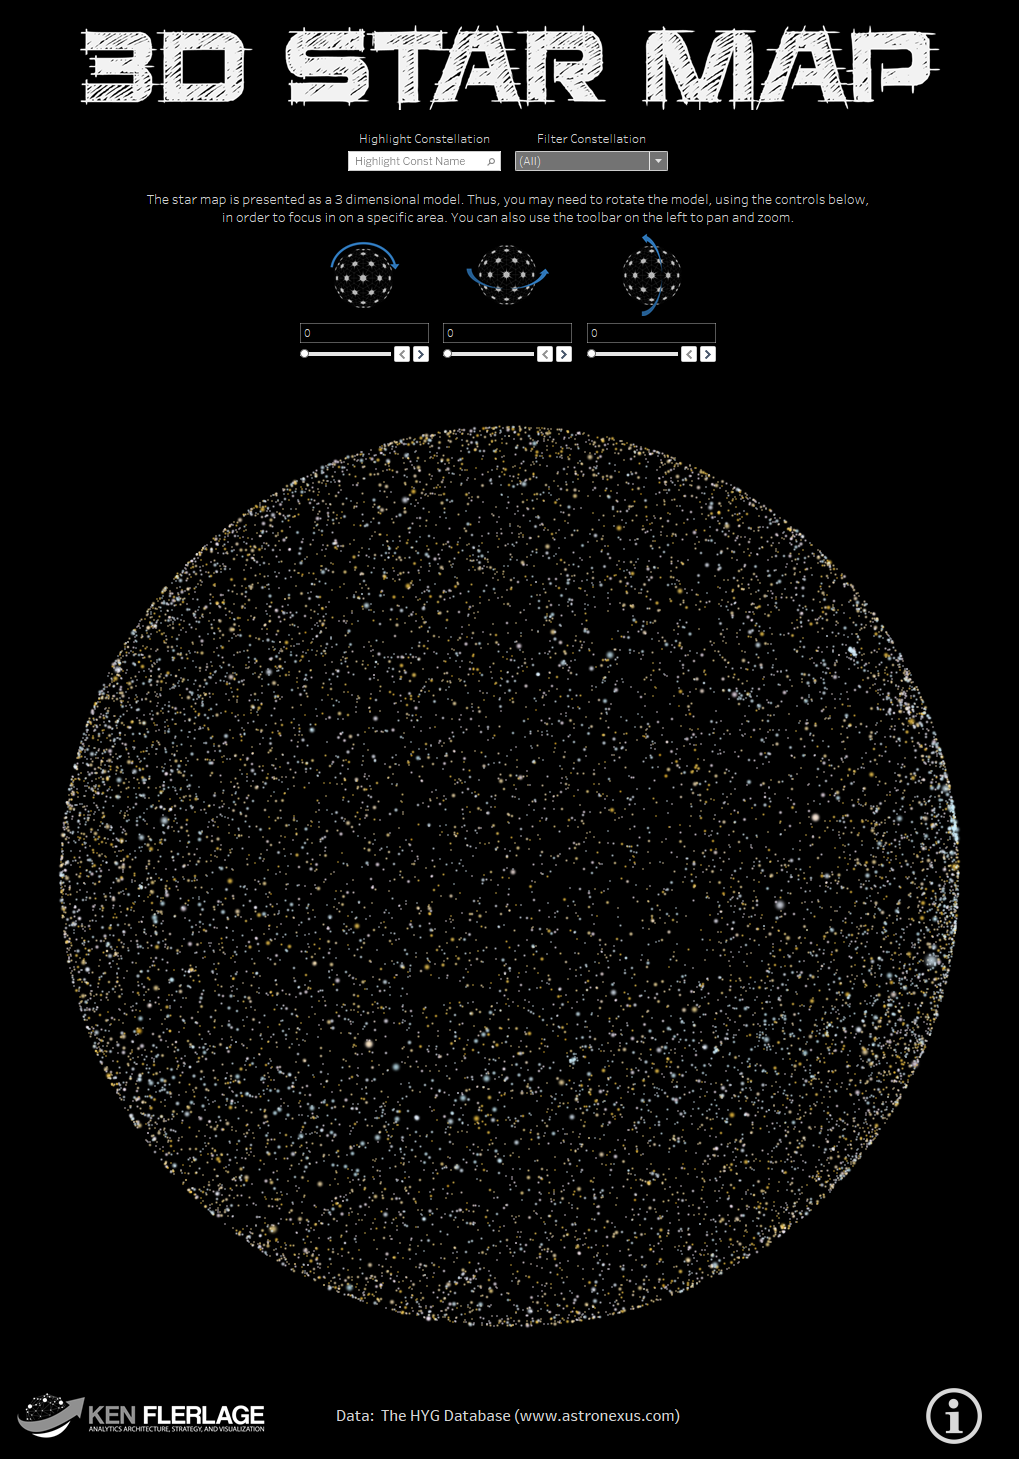 Workbook: 3D Star Map